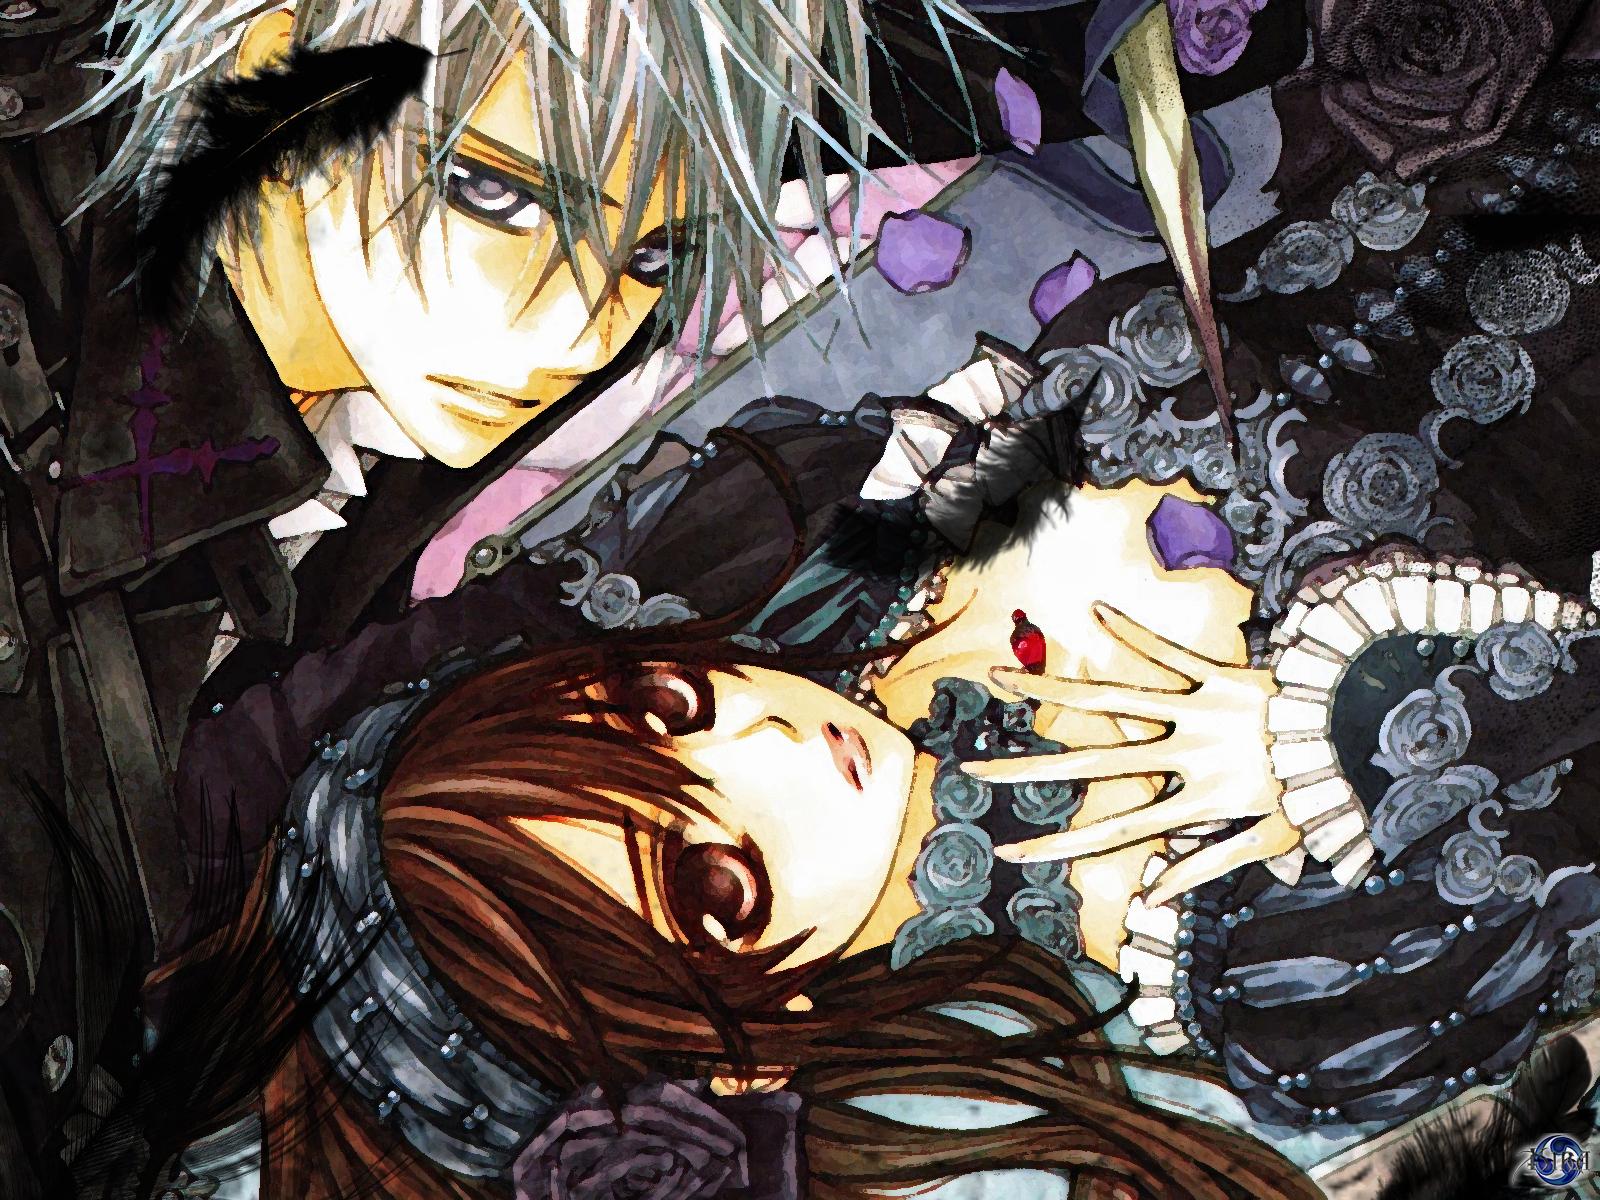 Vampire knight fondo de pantalla and fondo de escritorio - Vampire knight anime wallpaper ...